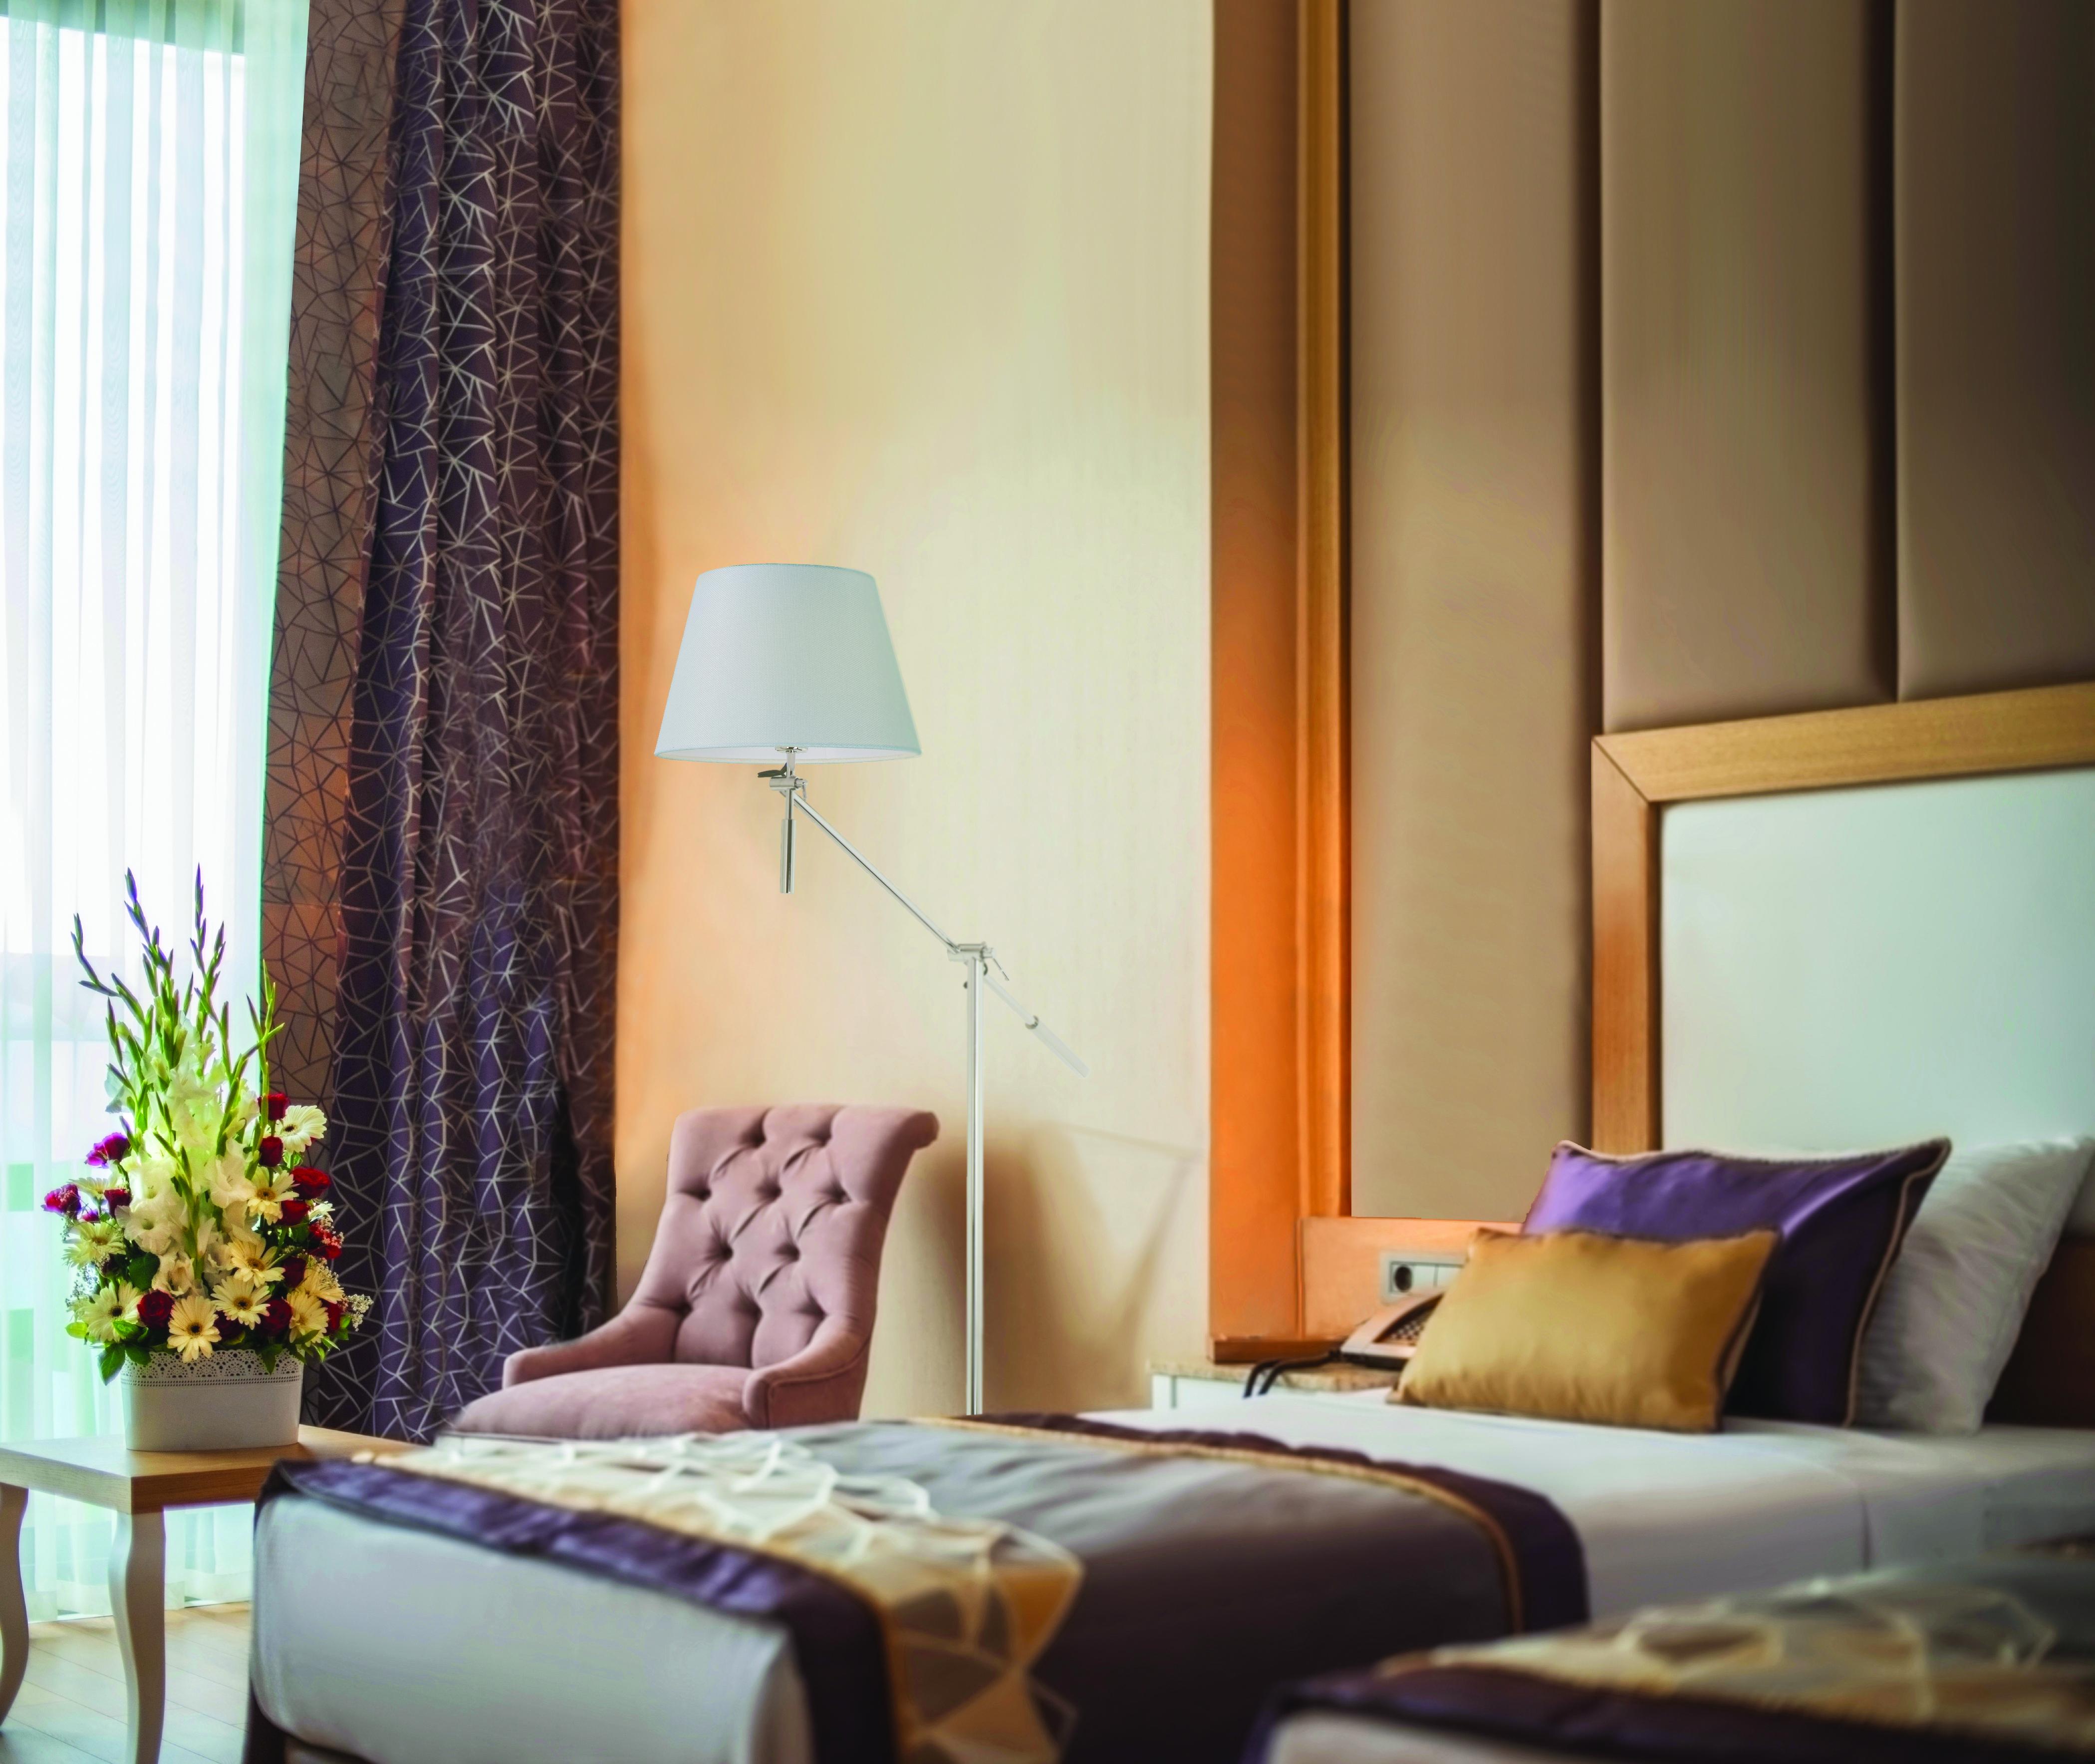 hotel bedroom lighting. hotel led 1-light floor lamp bedroom lighting r